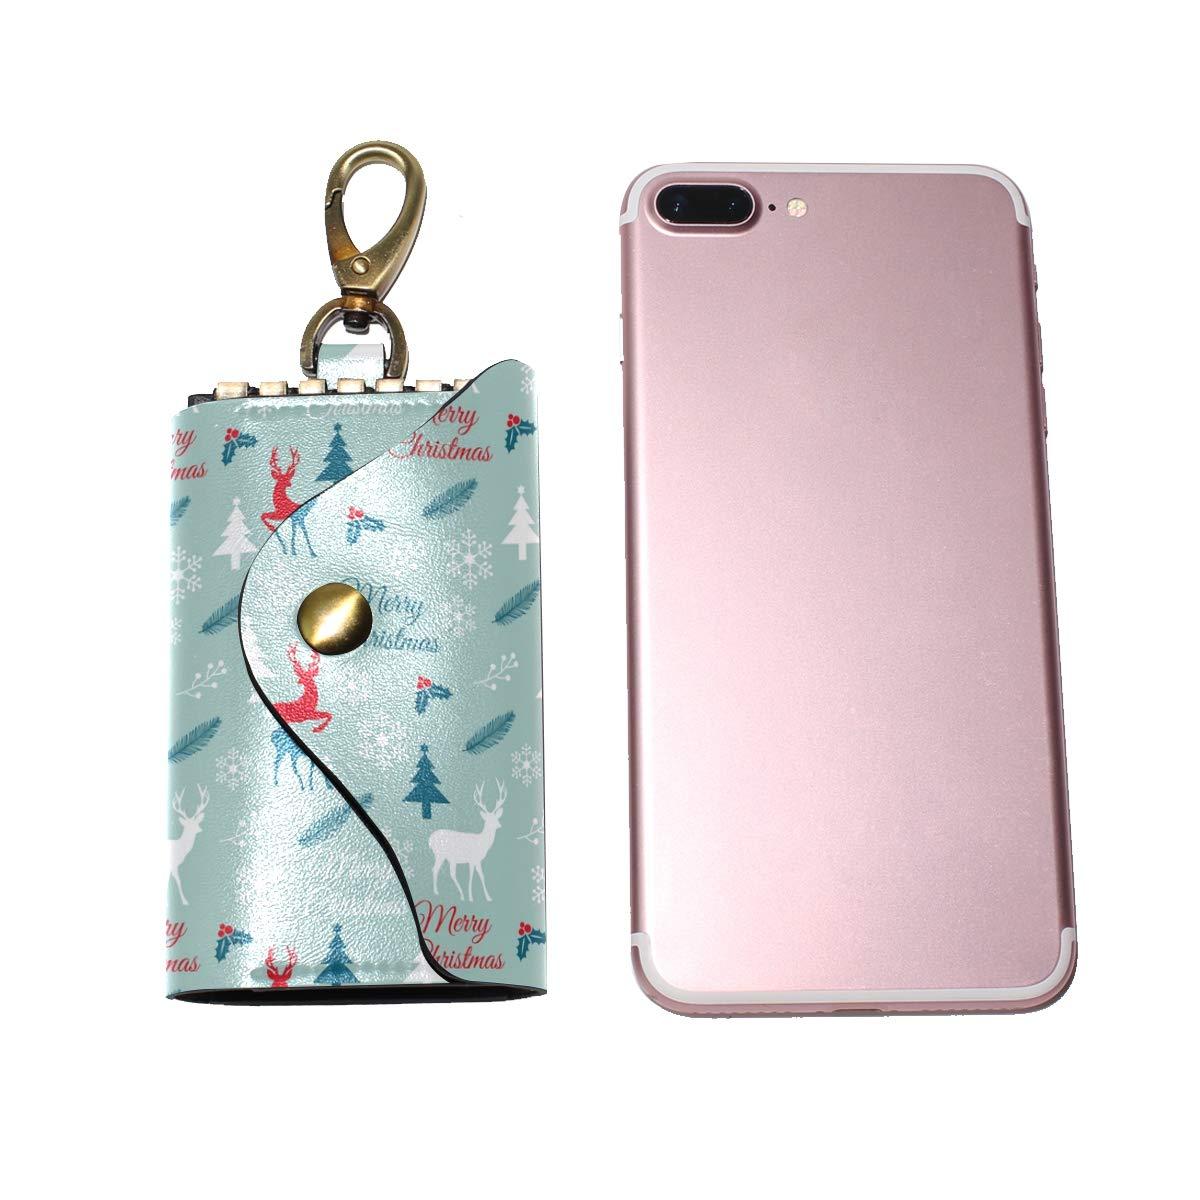 KEAKIA Christmas Pattern Leather Key Case Wallets Tri-fold Key Holder Keychains with 6 Hooks 2 Slot Snap Closure for Men Women